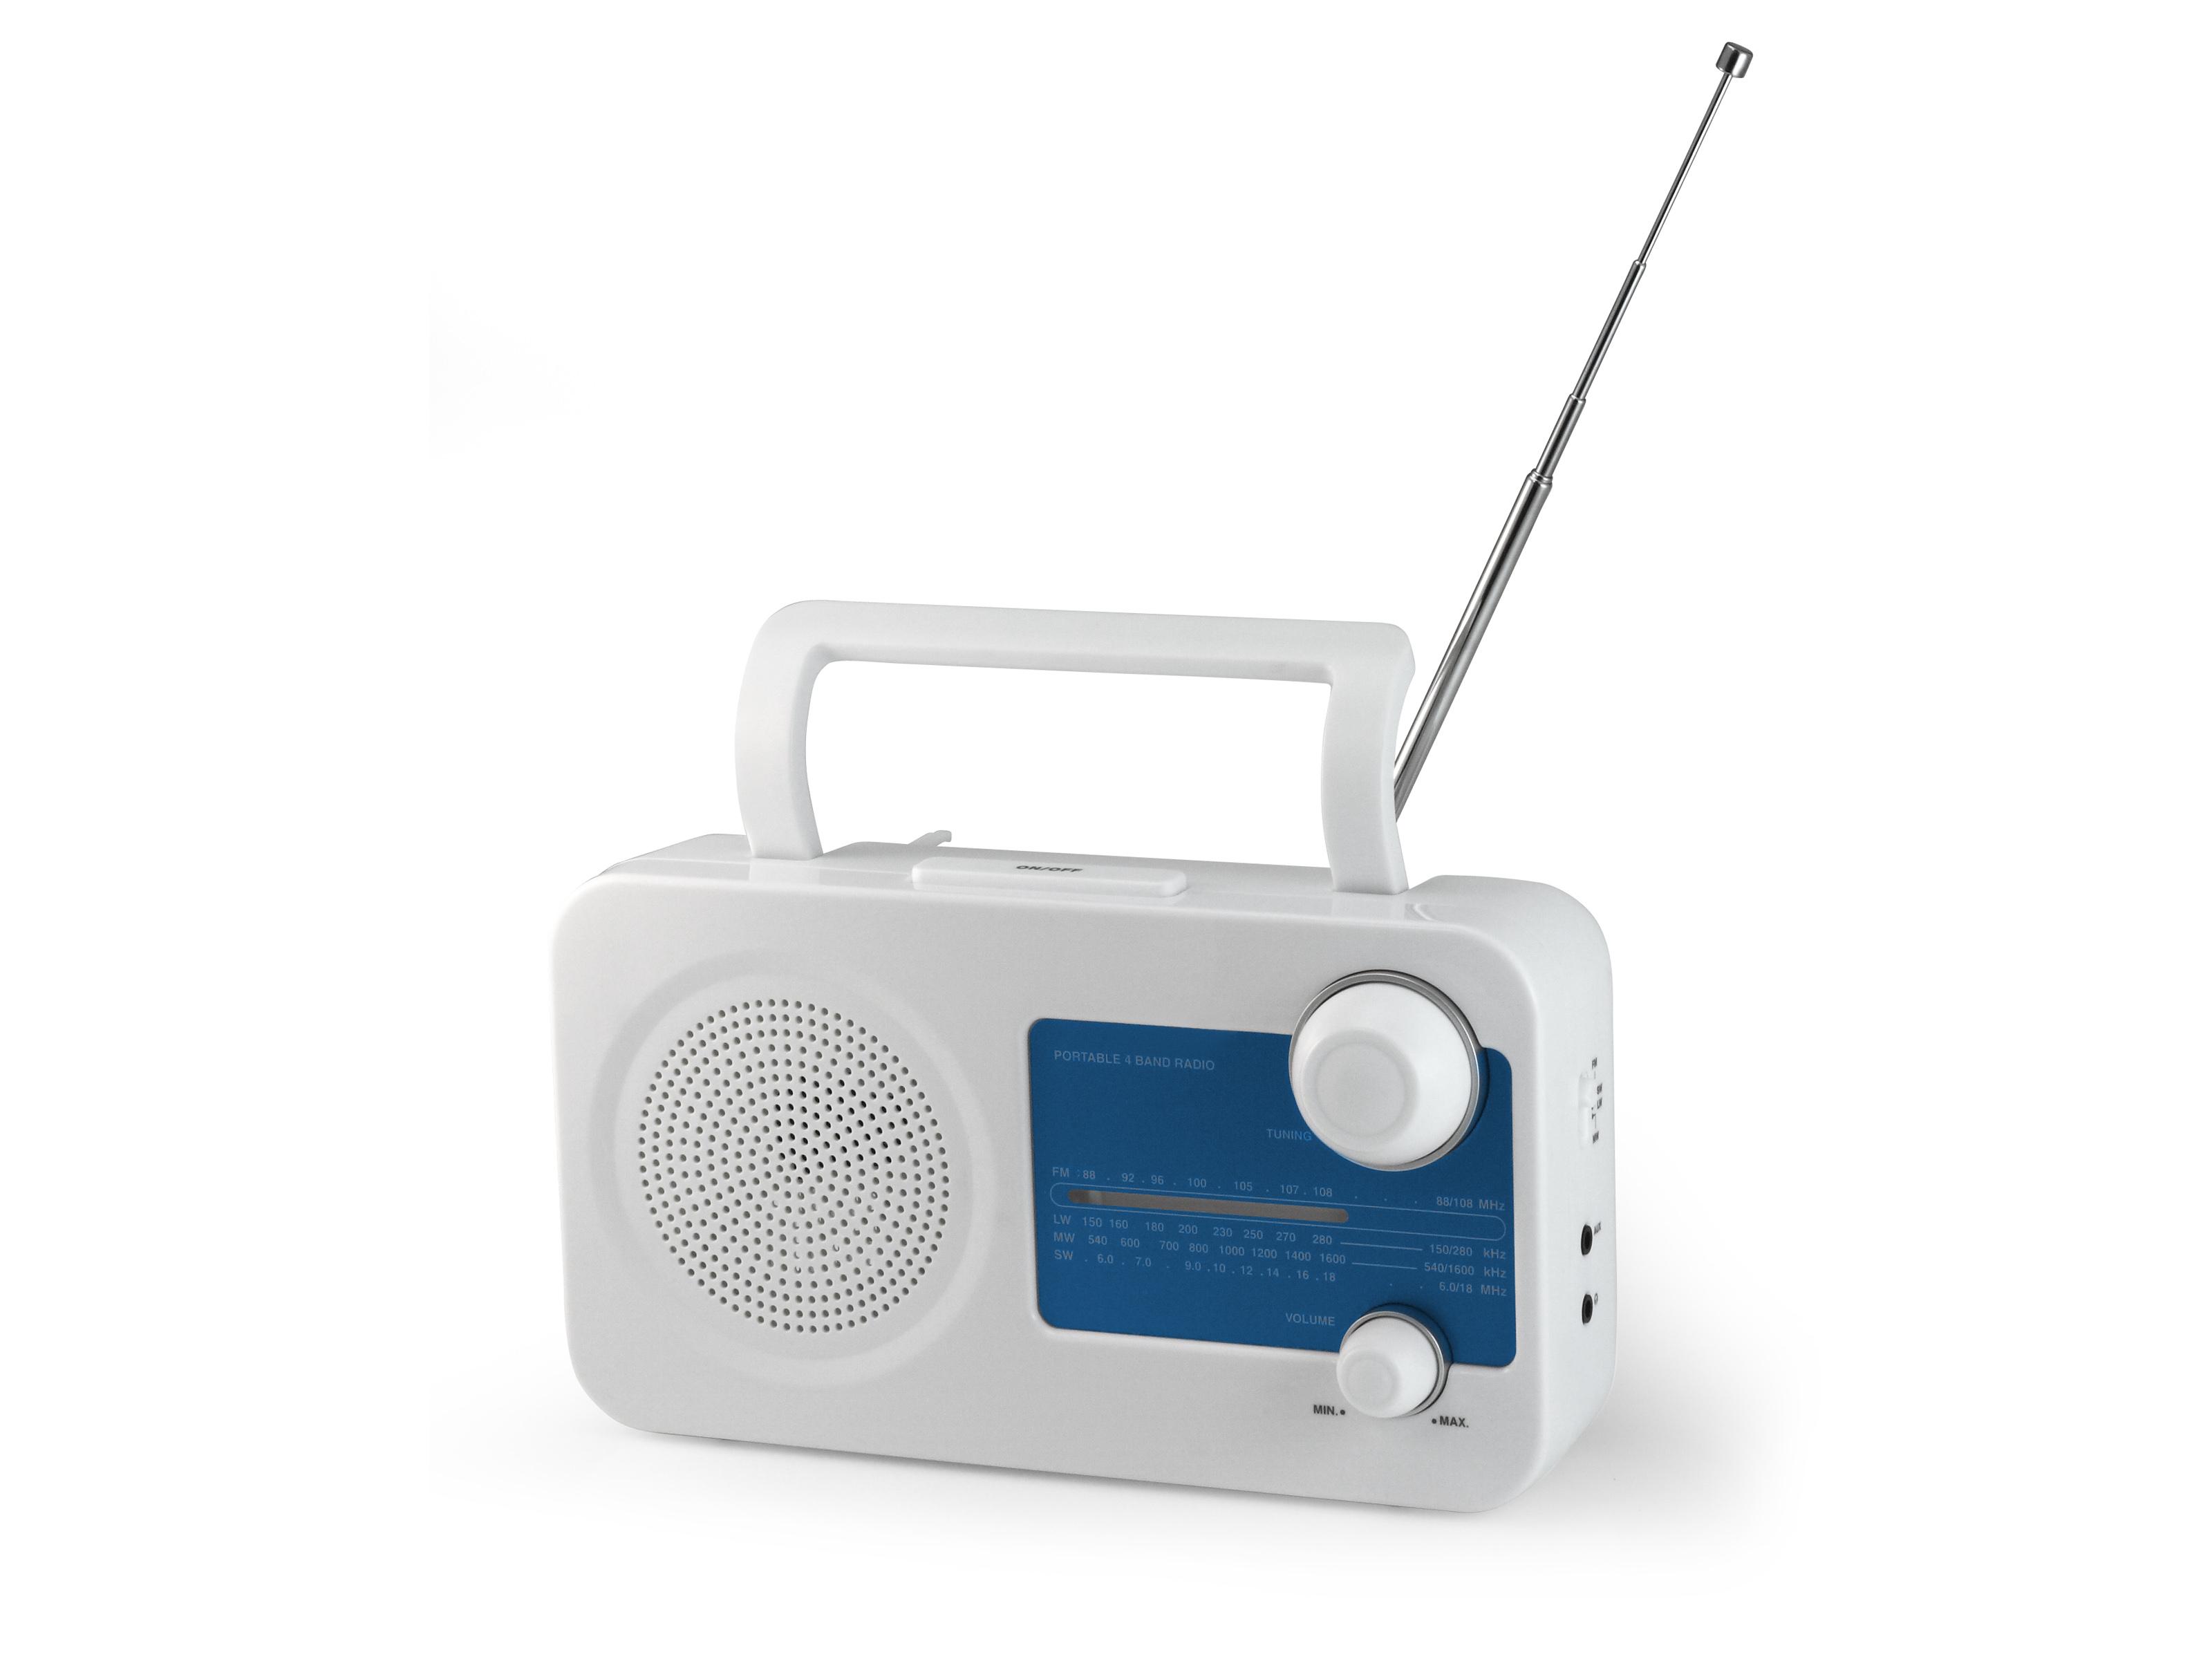 AudioSonic RD-1547 Portatile Blu, Bianco radio